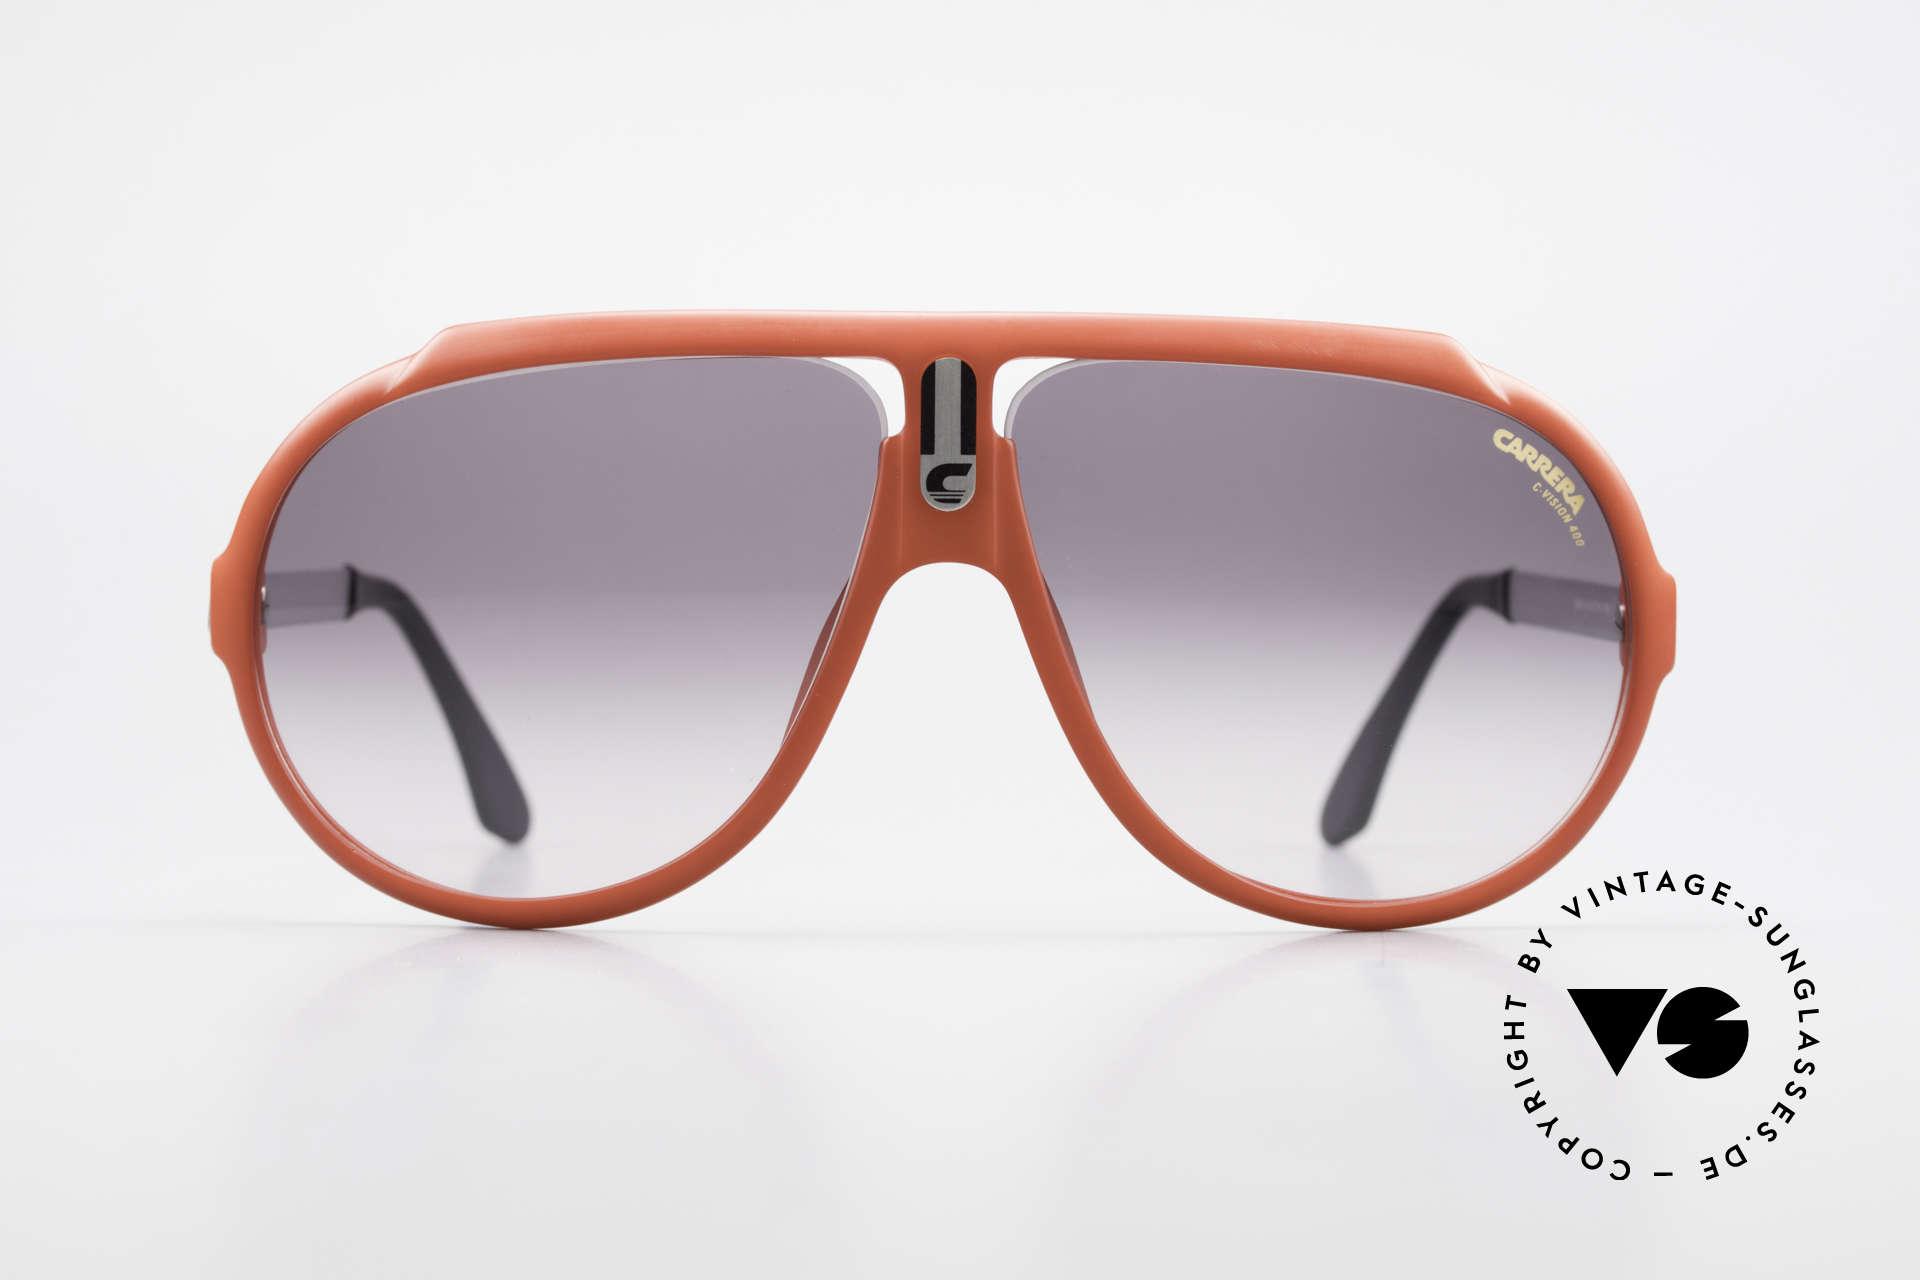 Carrera 5512 80's Sunglasses Miami Vice, famous movie sunglasses from 1984 (a true legend !!!), Made for Men